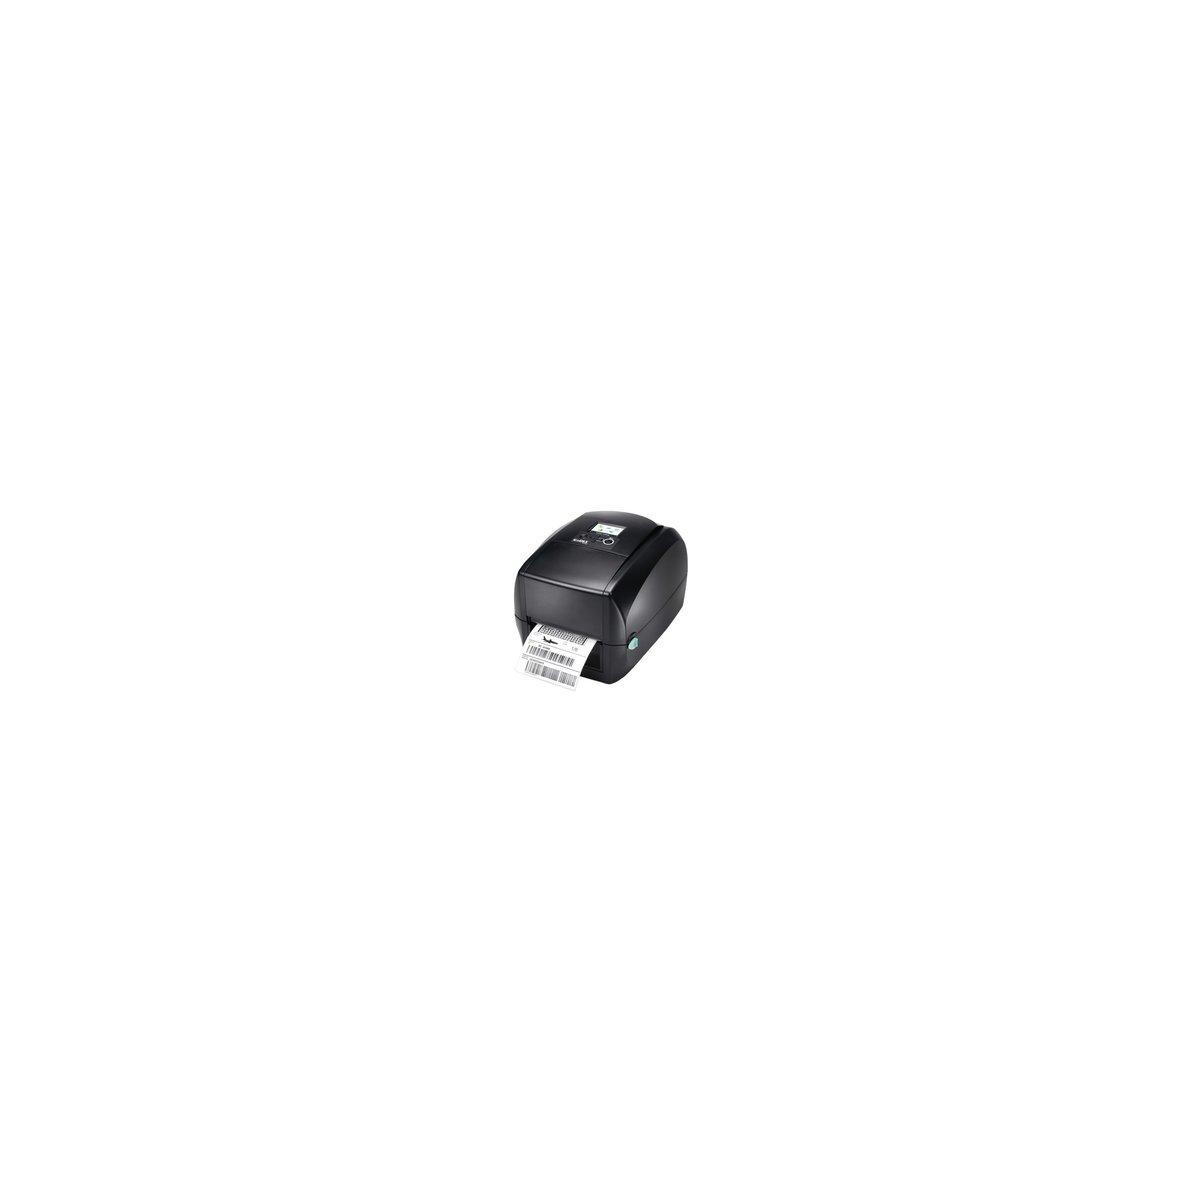 Godex Drucker RT700iW-200dpi